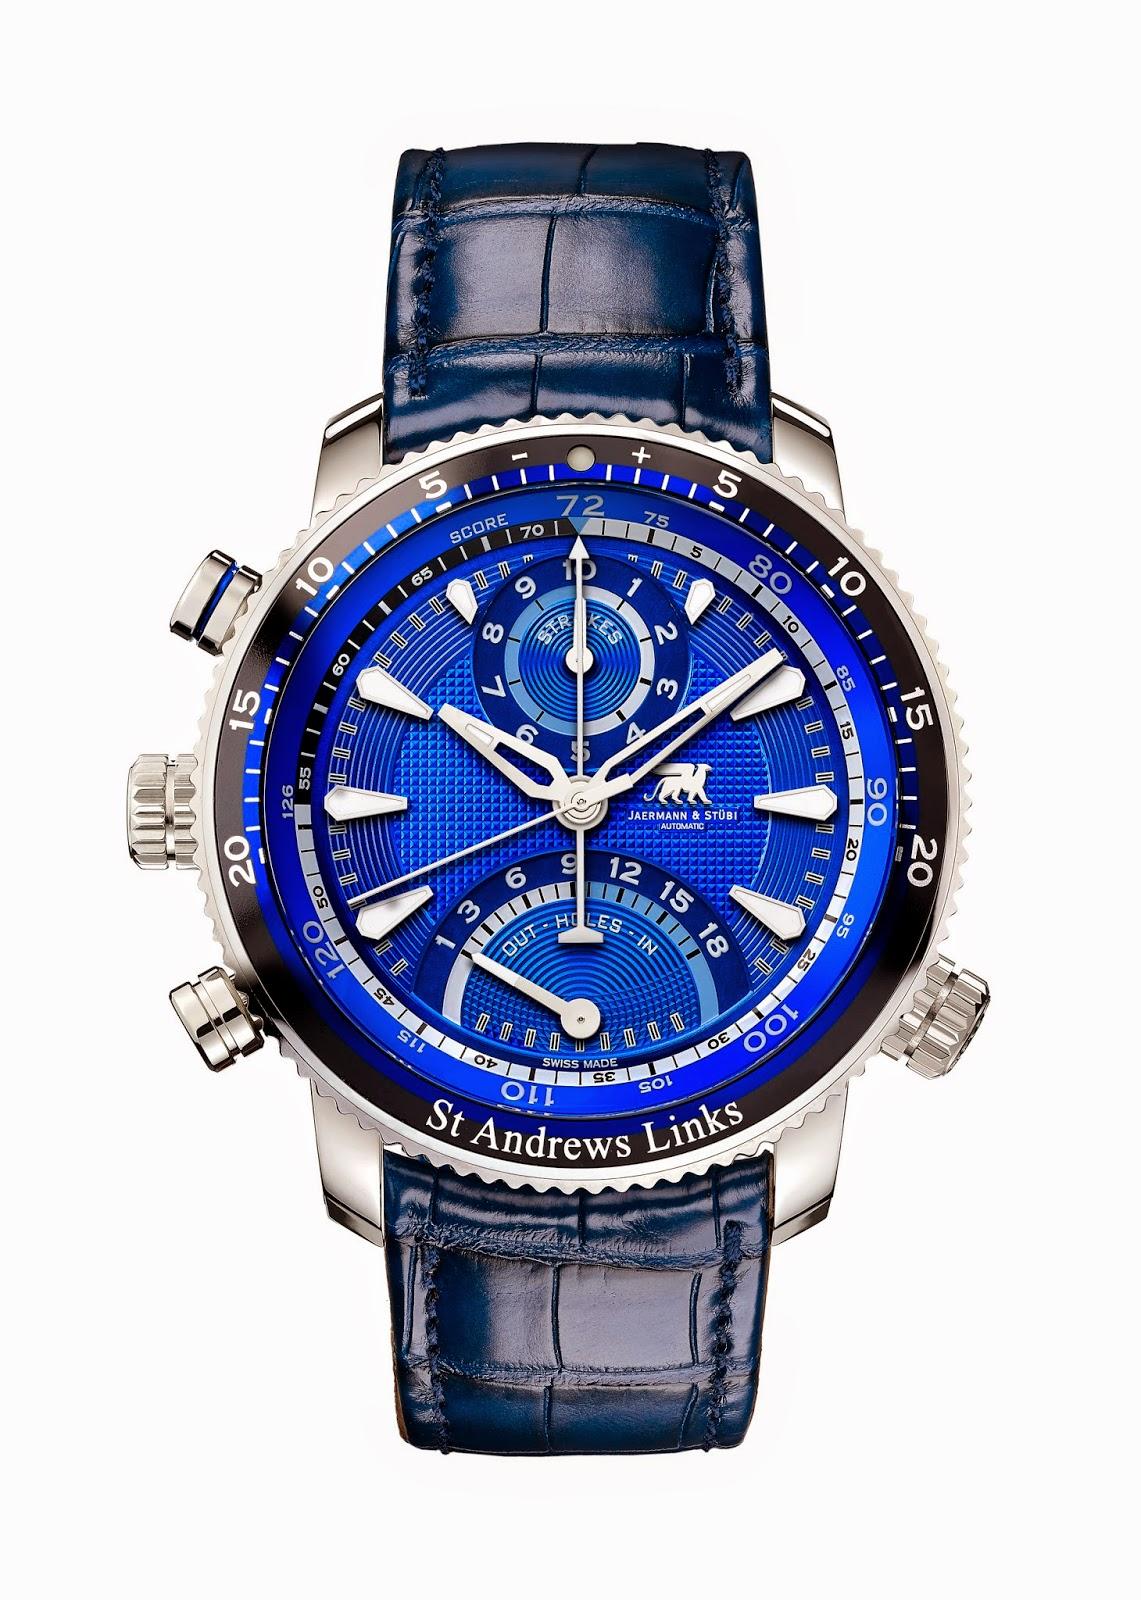 Jaermann & Stübi the The Timepiece Of Golf 2